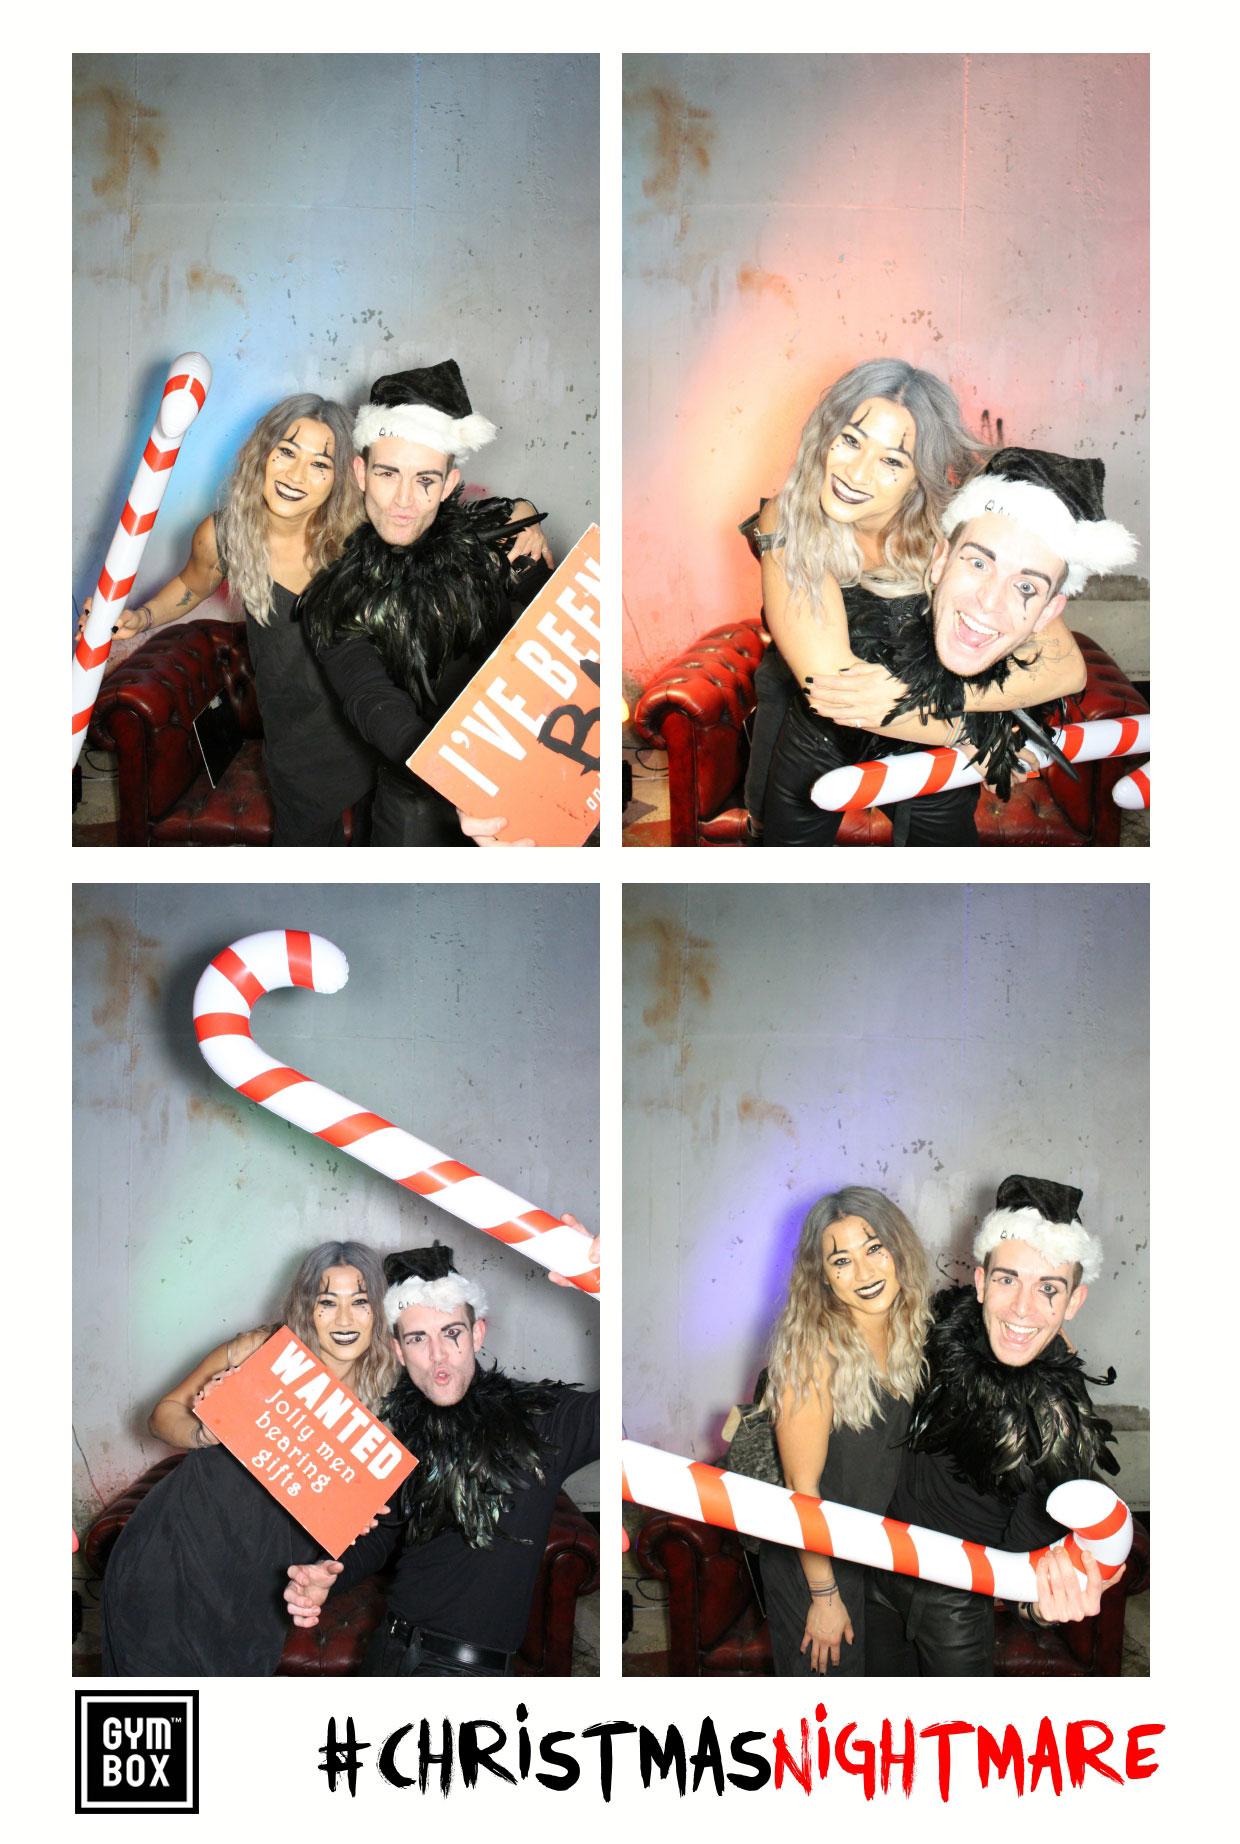 Gymbox-Nightmare-before-christmas-photobooth.jpg